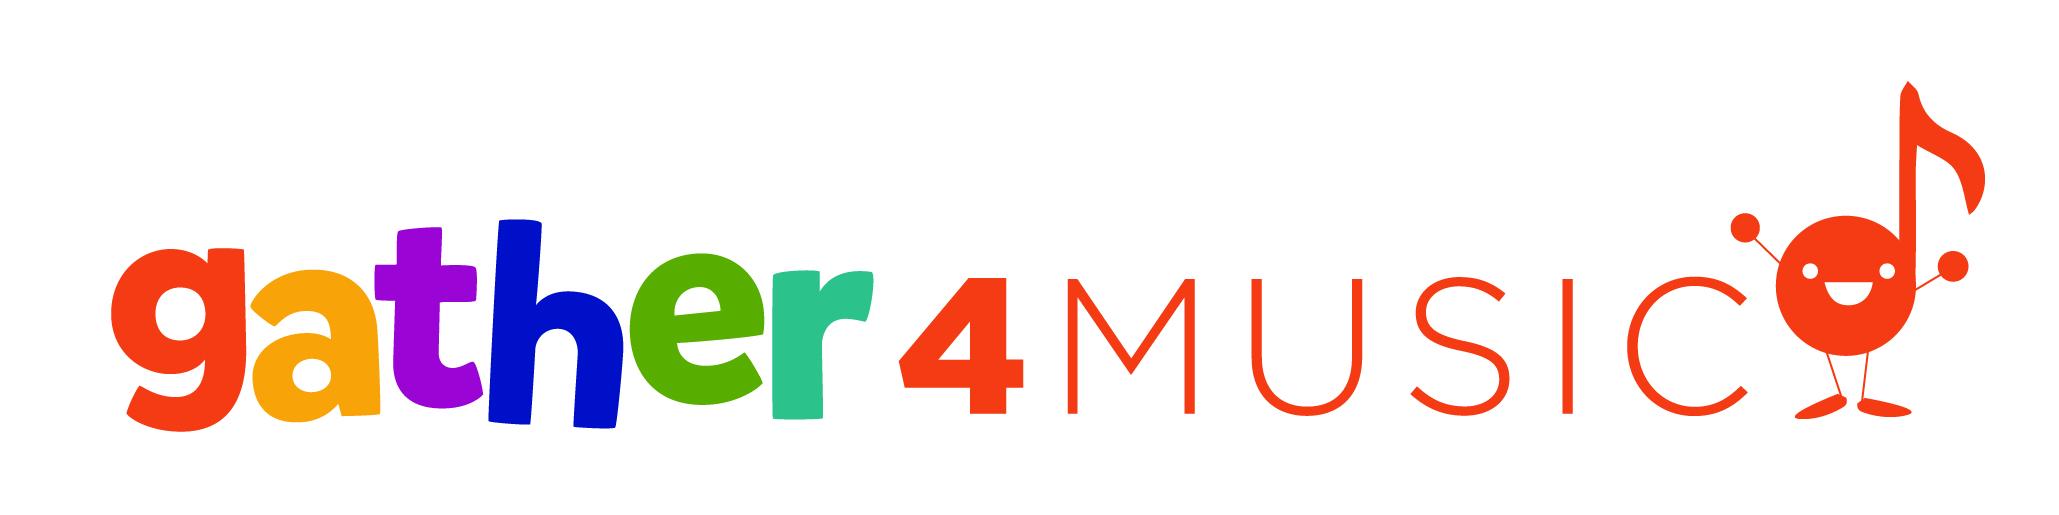 gather-sub-music.jpg